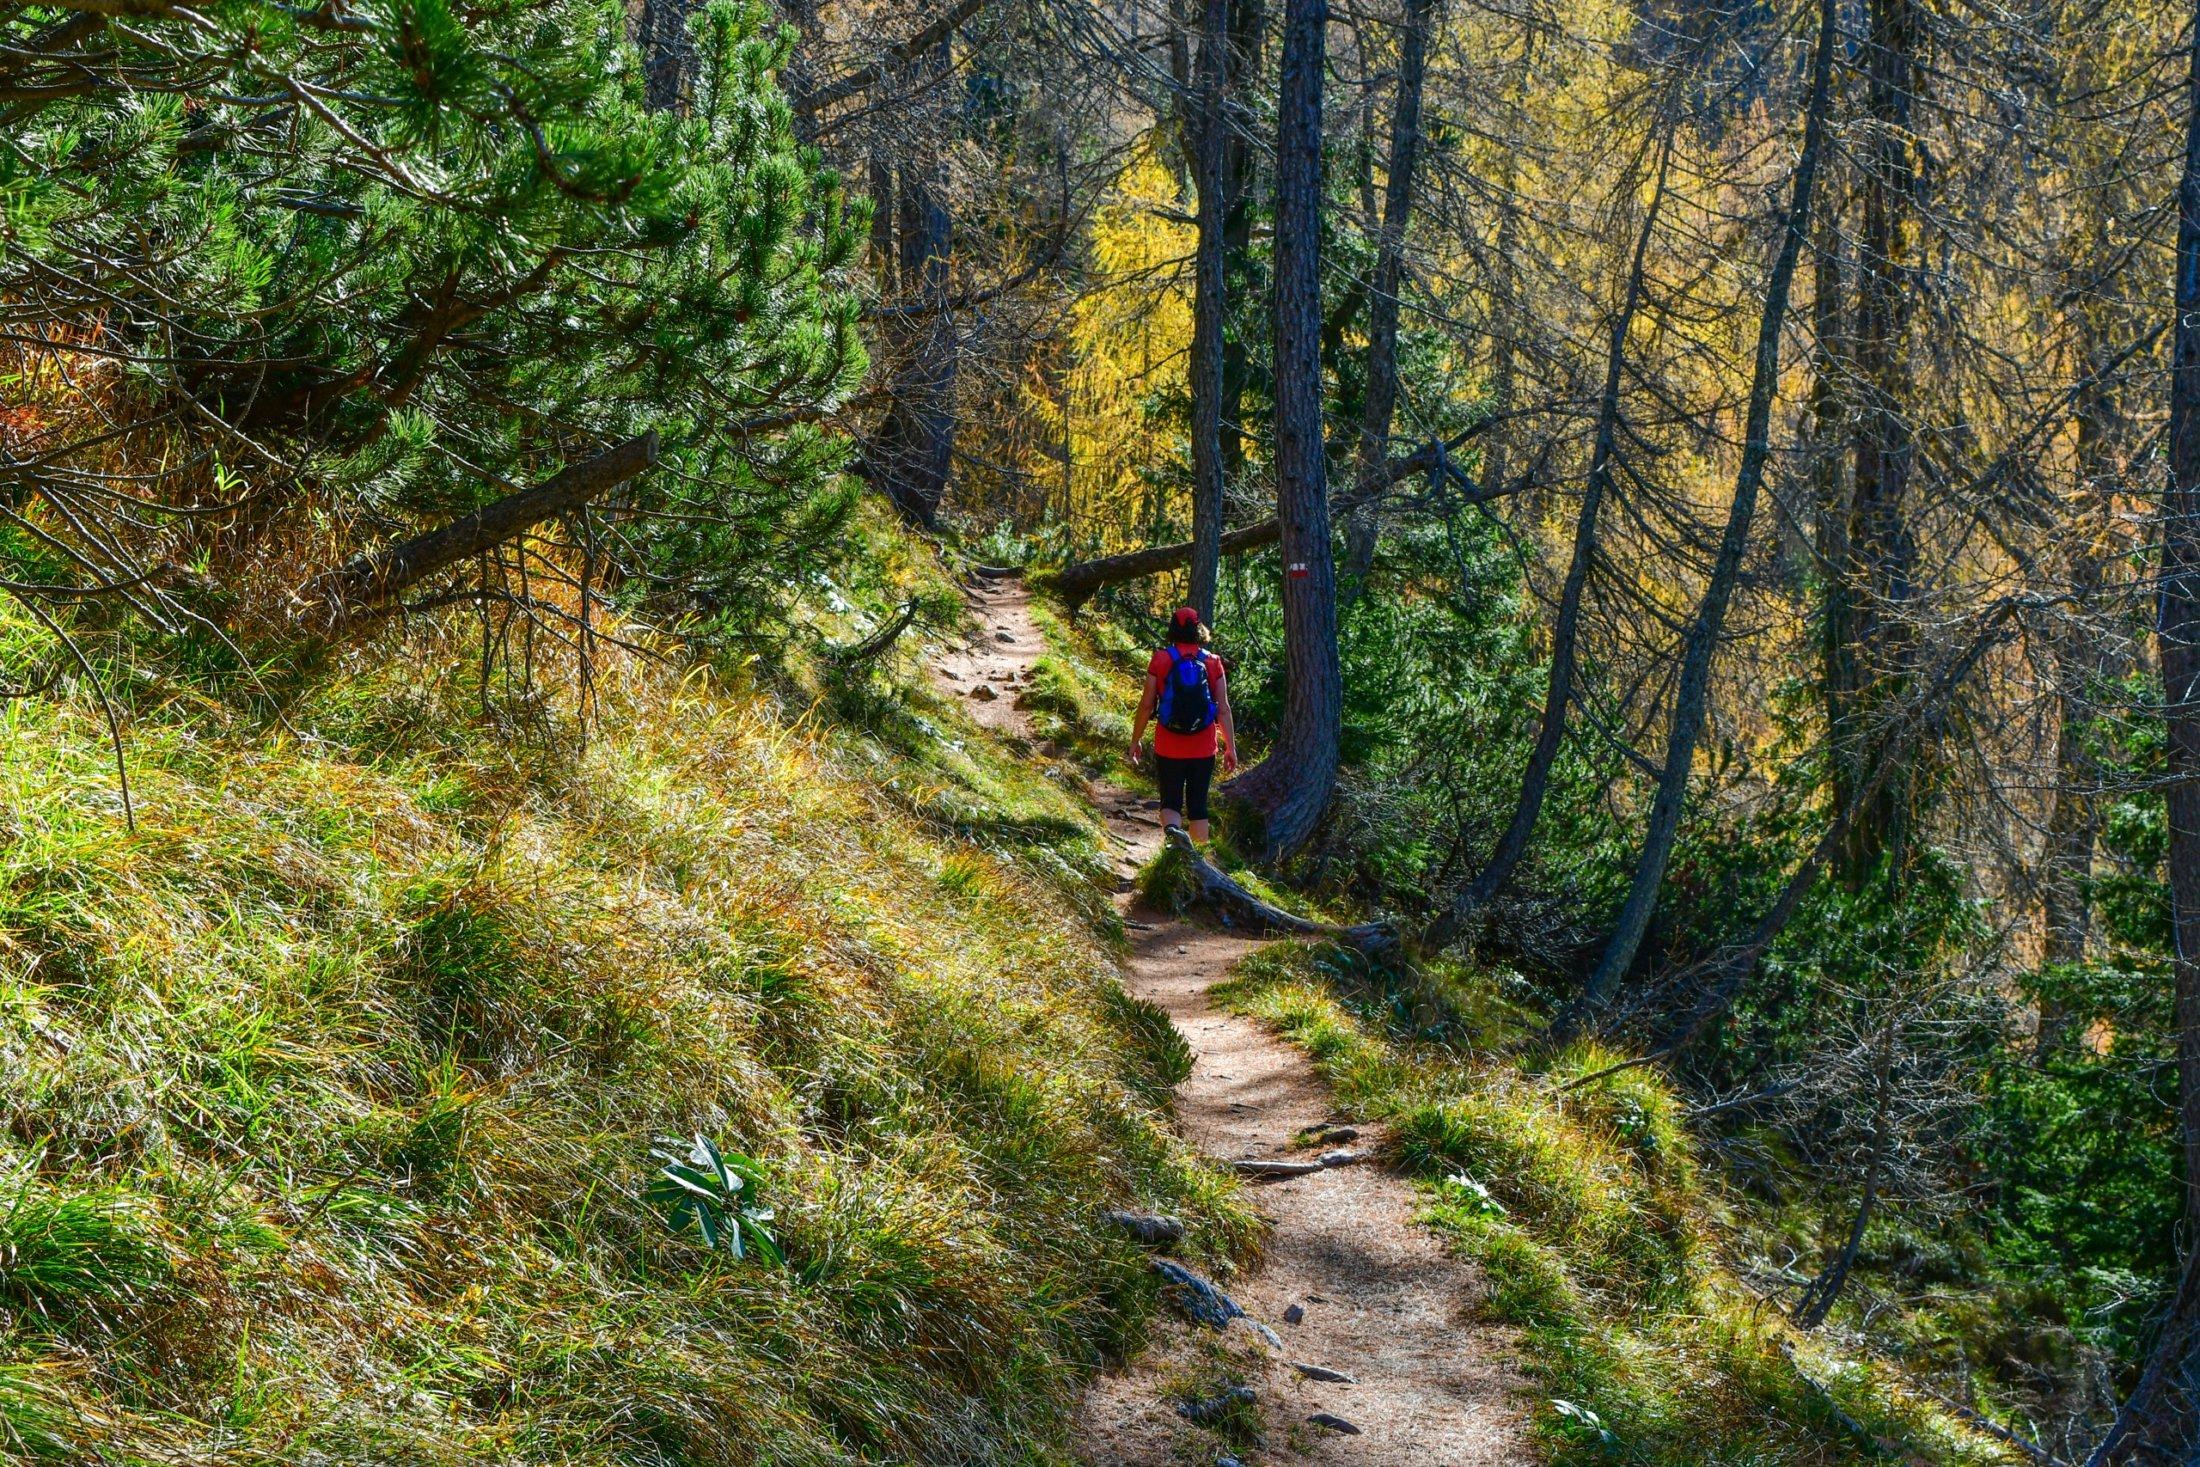 Aufstieg zur Cima del Cacciatore